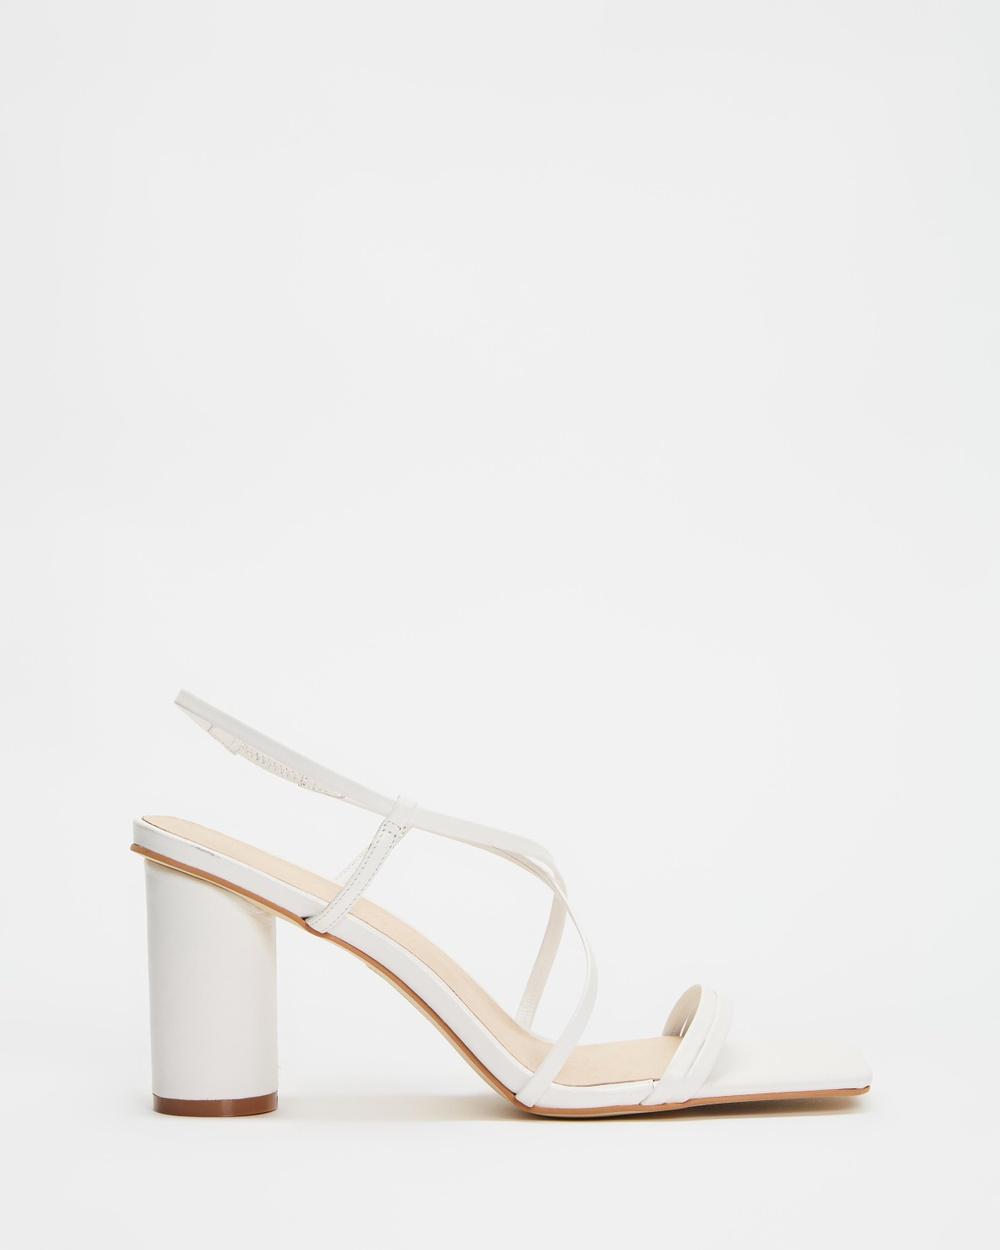 Sol Sana THE ICONIC EXCLUSIVE Nova Heels Sandals White Australia